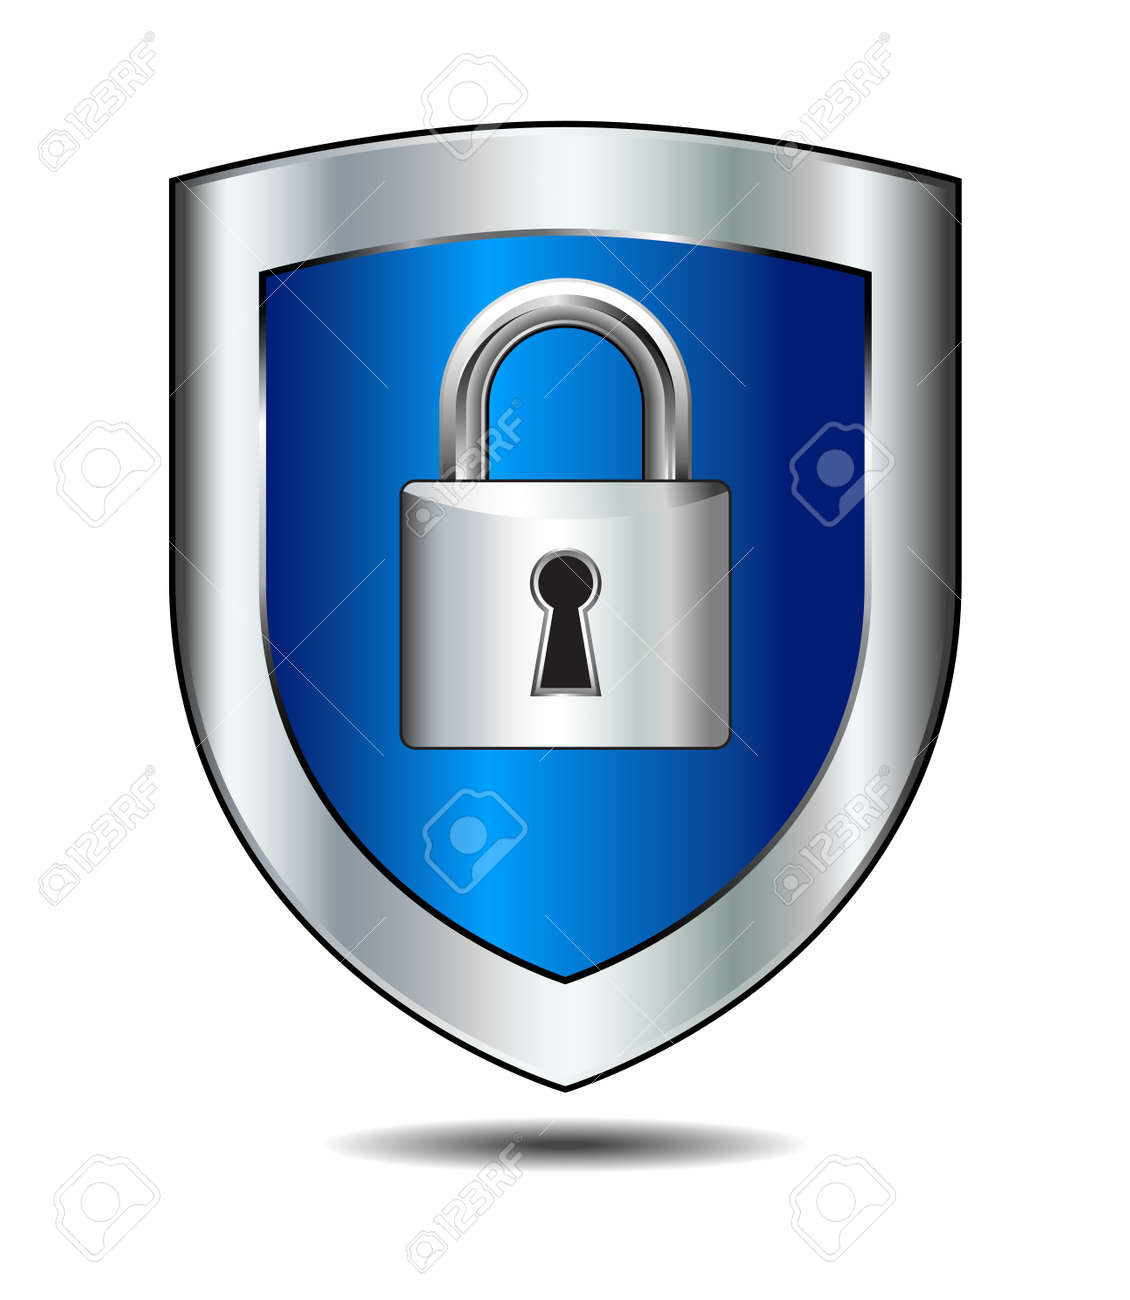 Shield Lock - 34402649